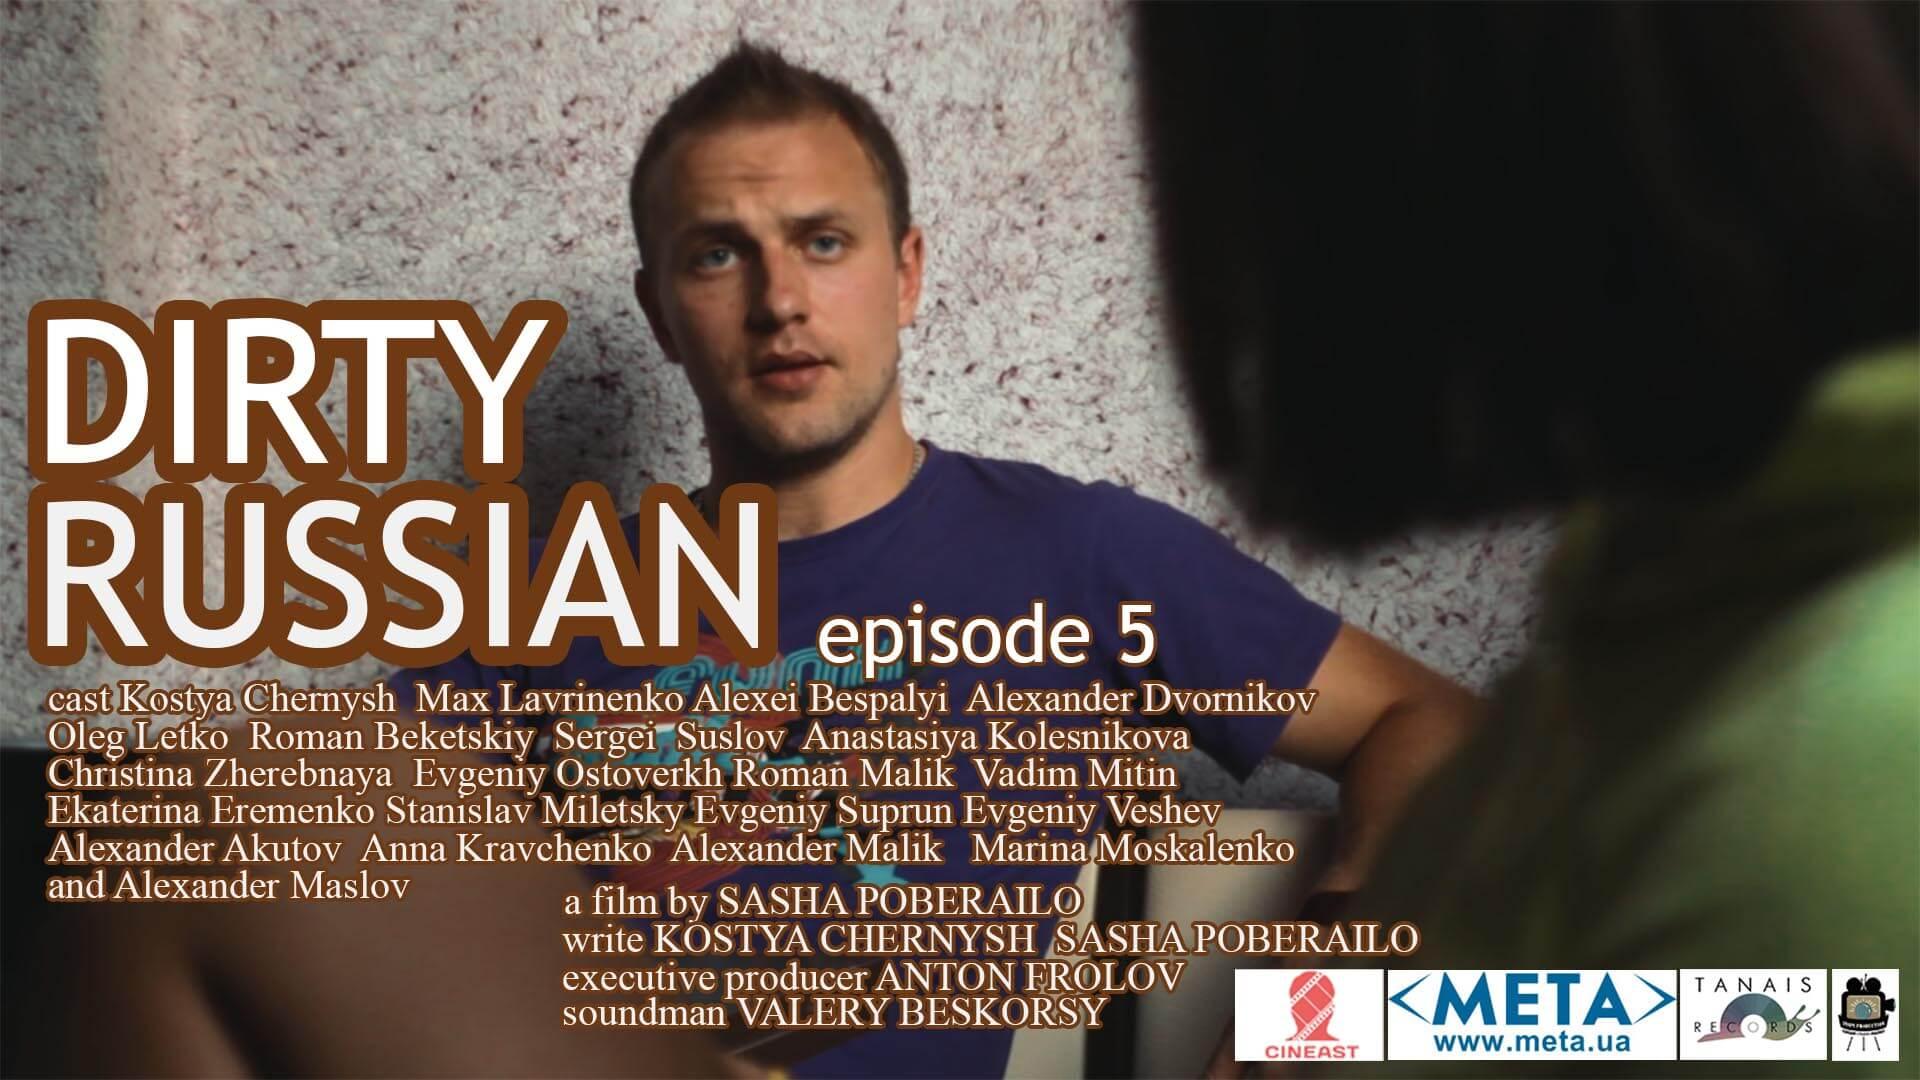 dirty russian episode 5 - Webseries